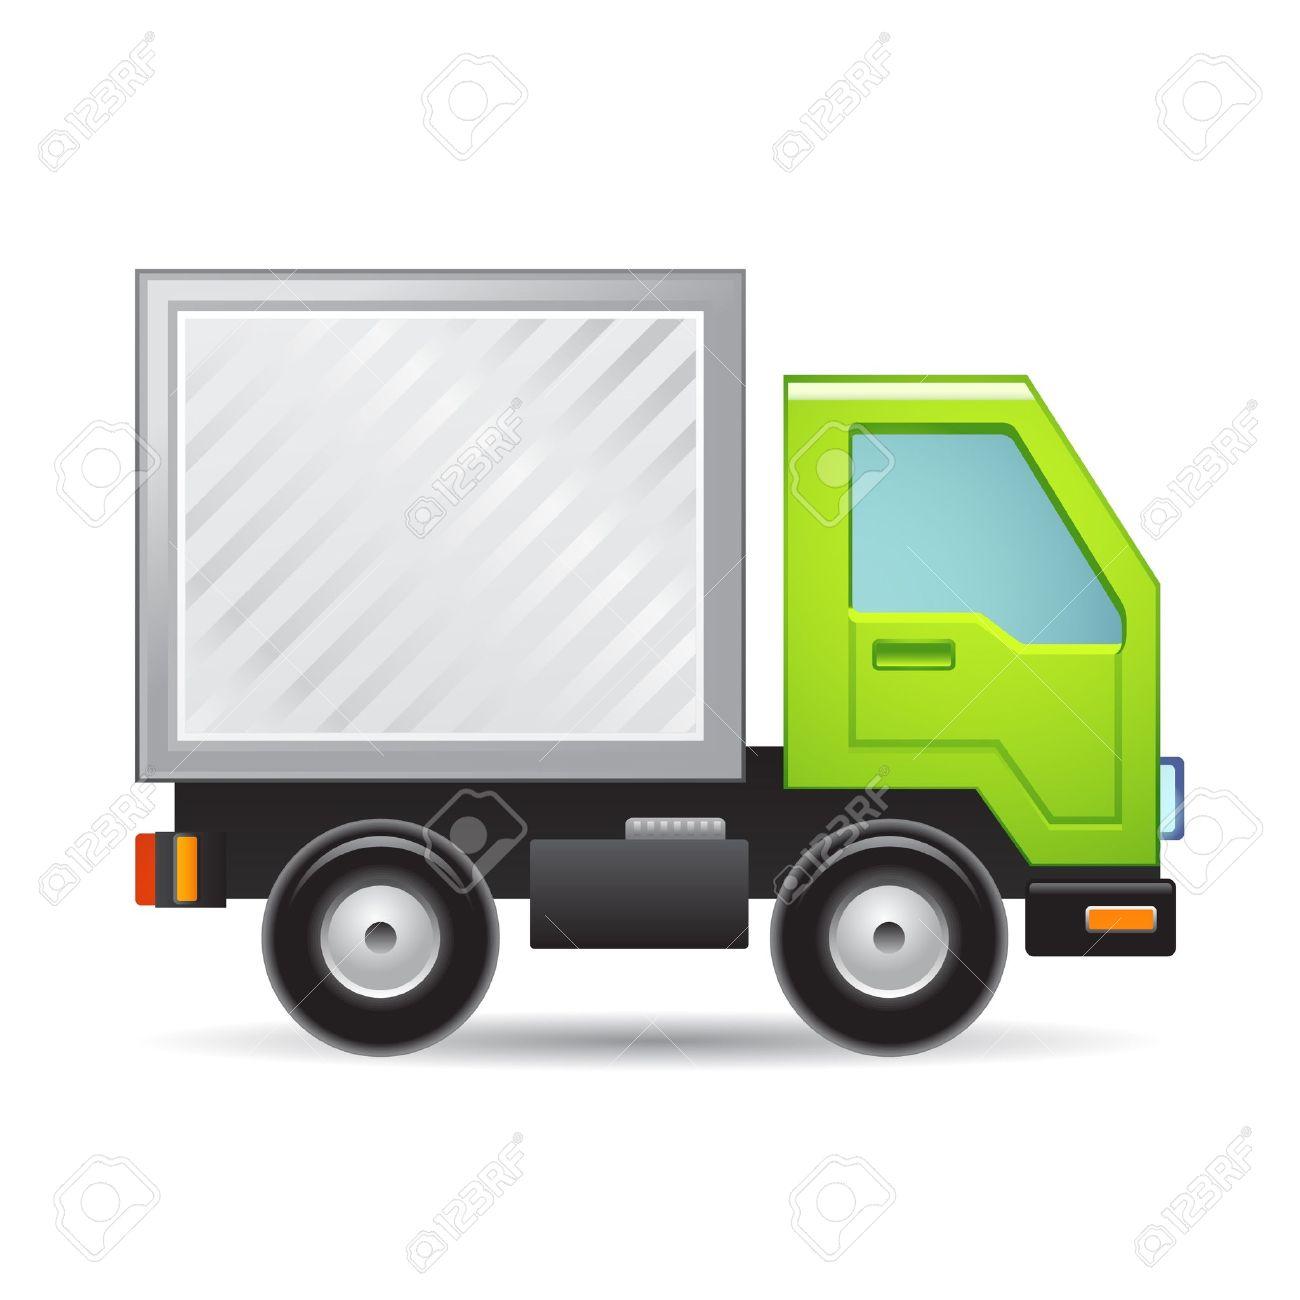 Green truck icon - 11660618